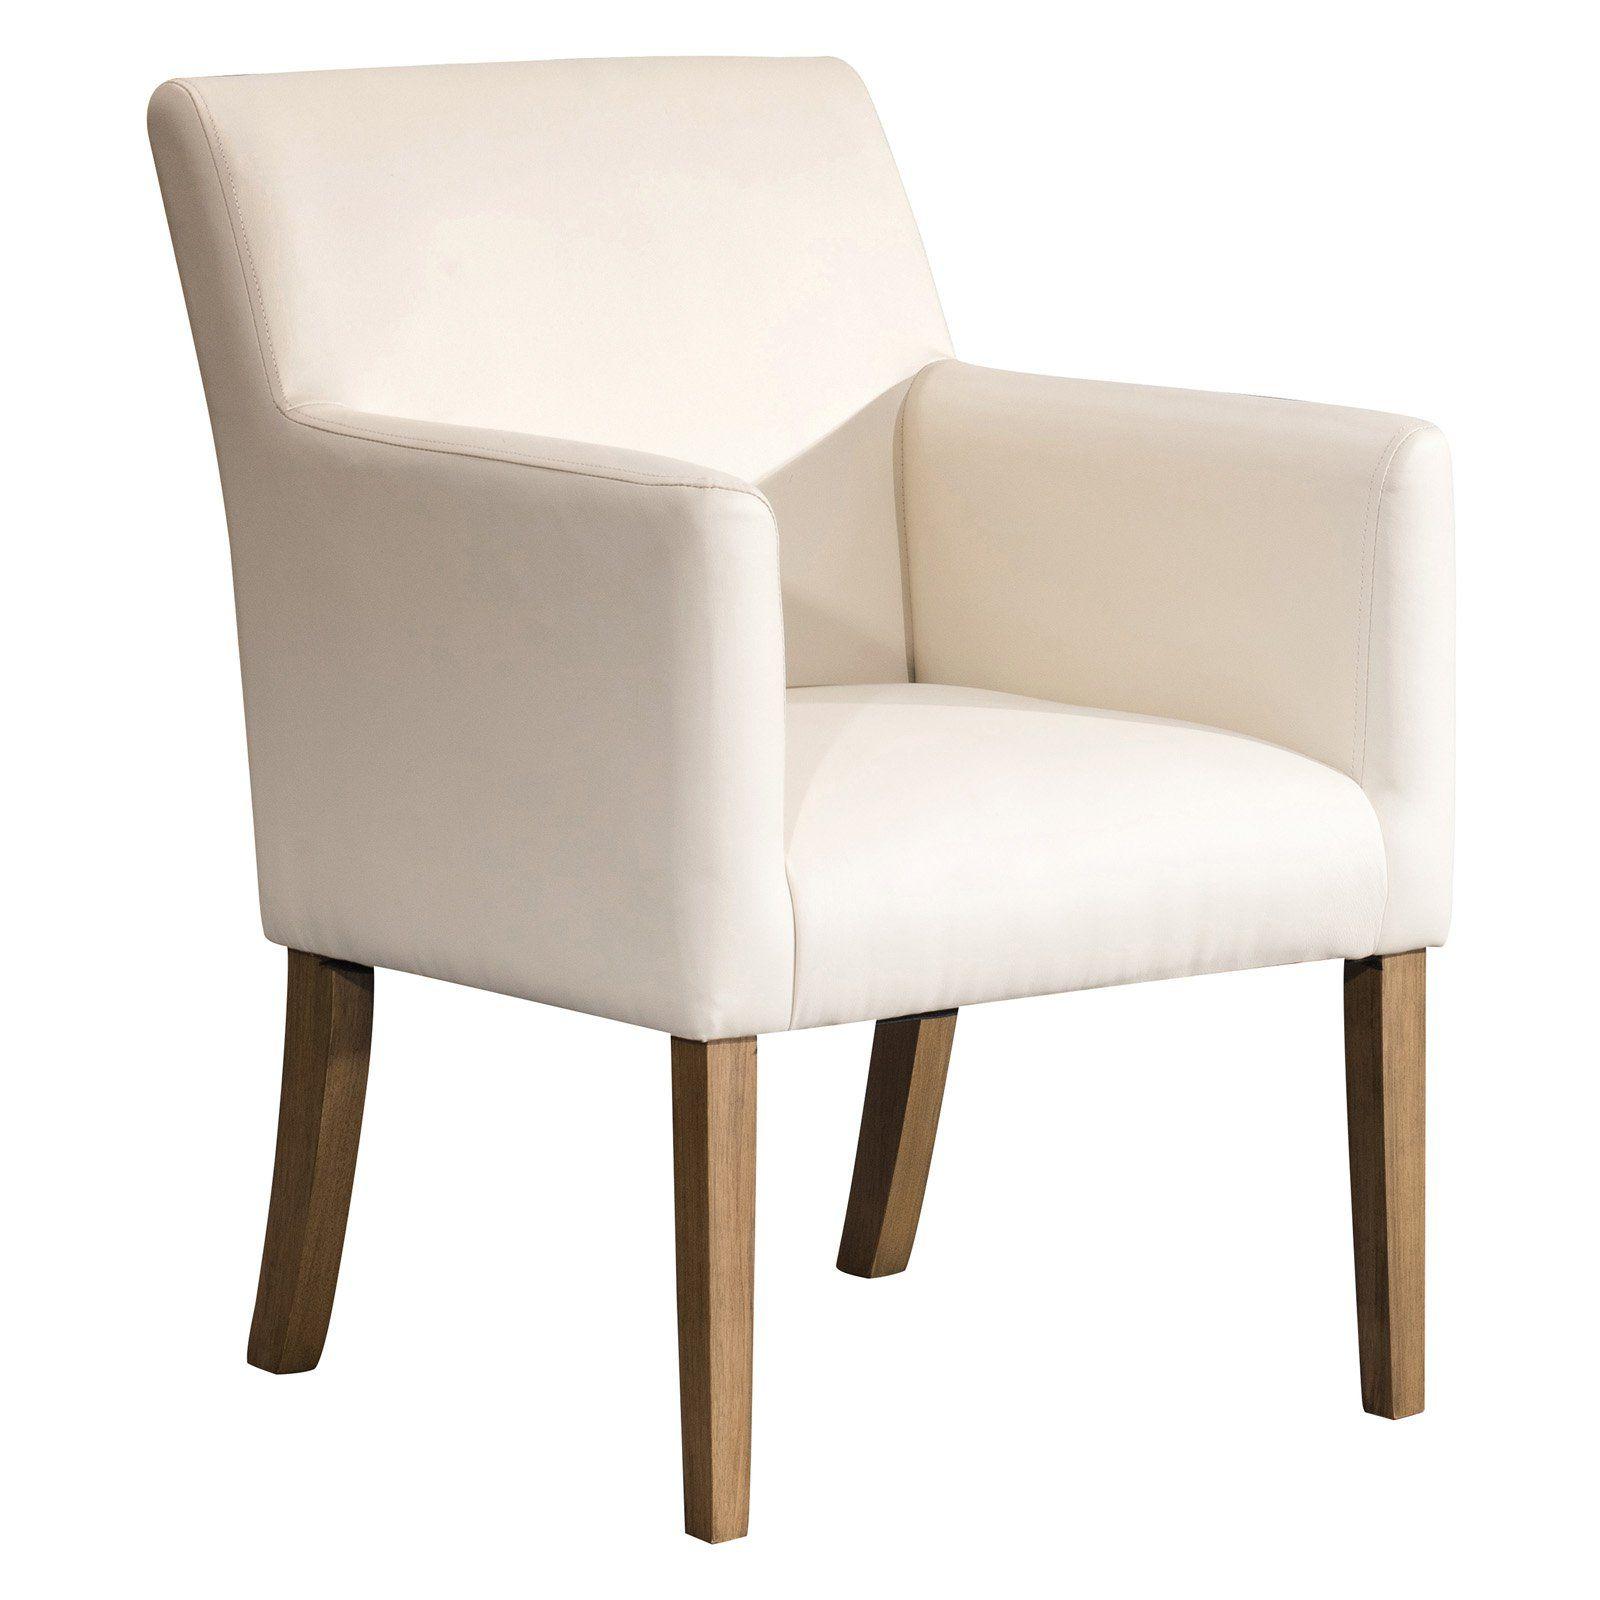 HomePop Lexington Dining Arm Chair Cream Faux leather